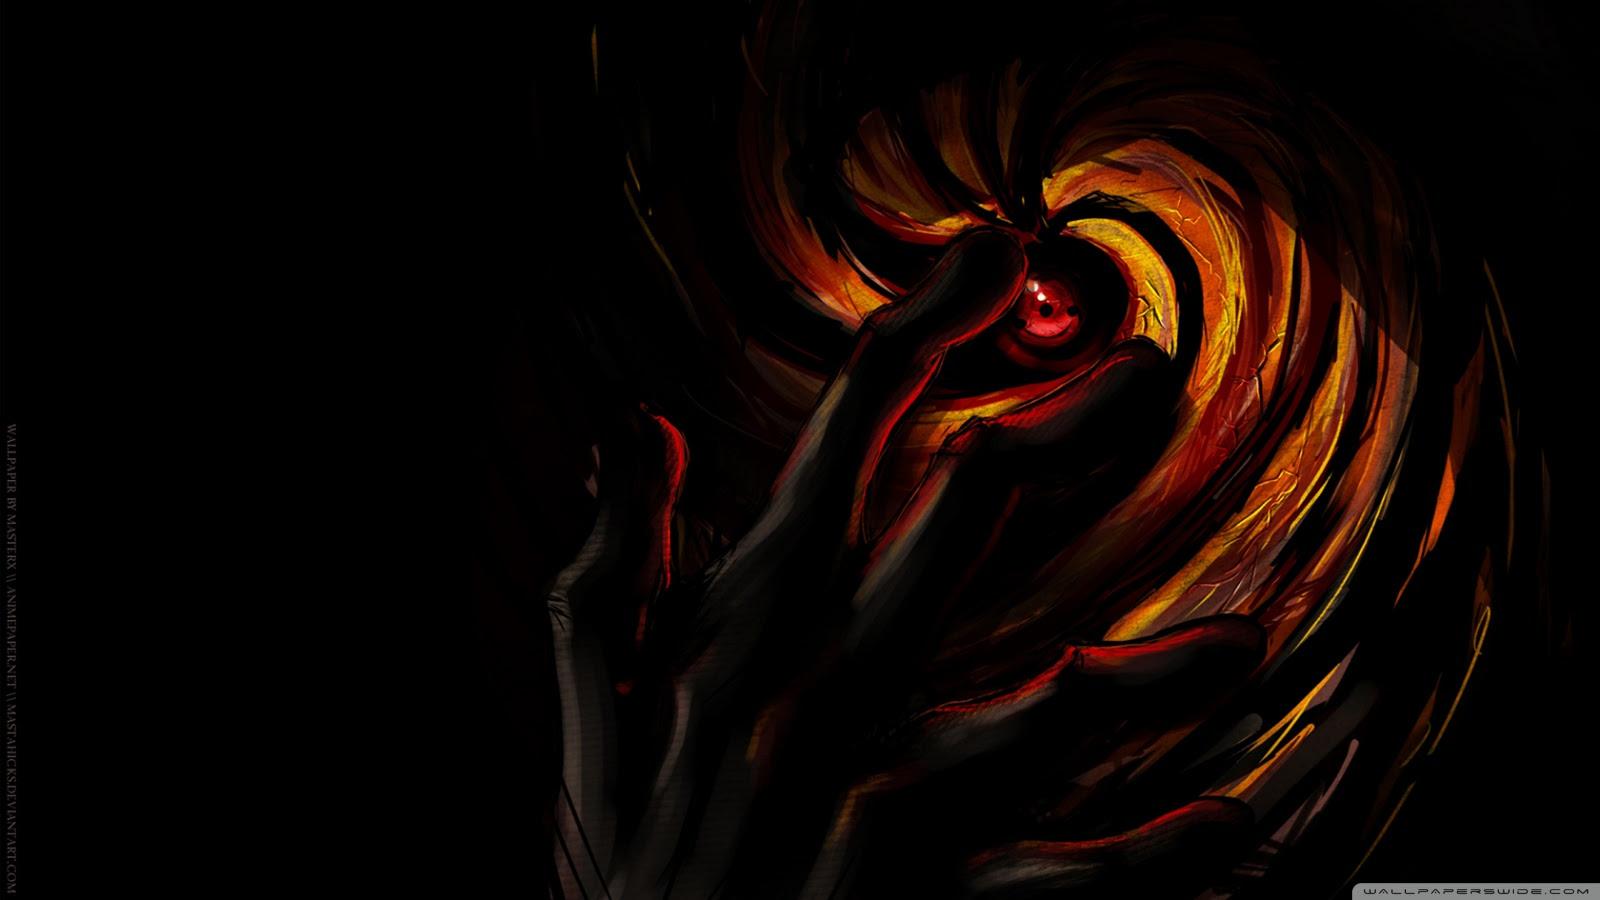 Unduh 9000 Wallpaper Hd Black Naruto